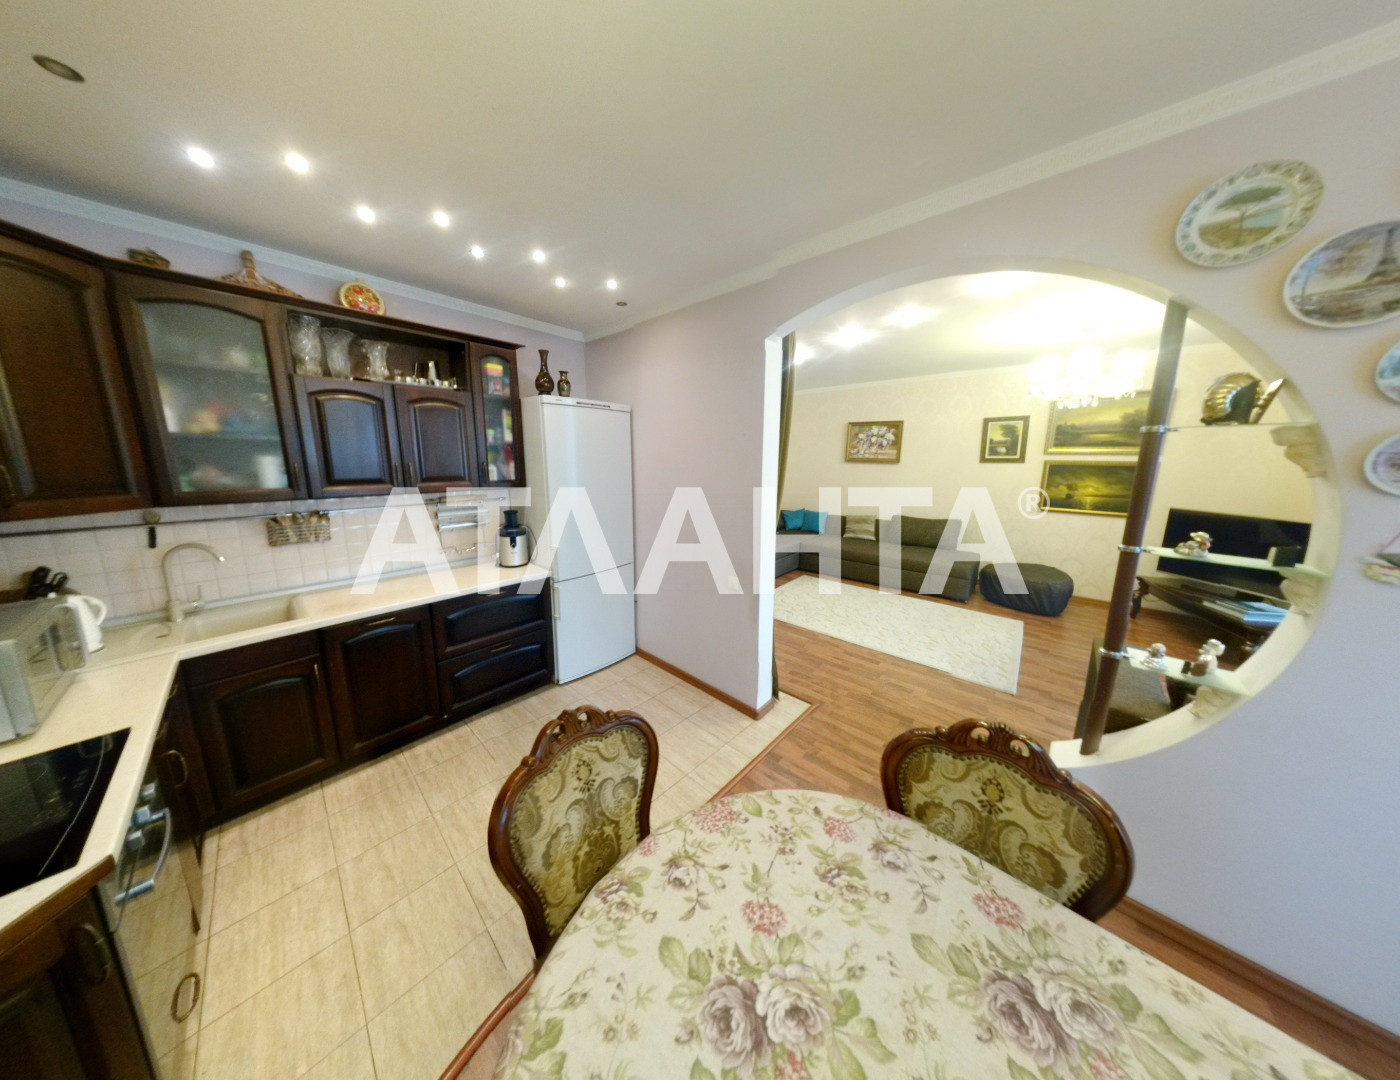 Продается 3-комнатная Квартира на ул. Ул. Ломоносова — 139 600 у.е. (фото №9)